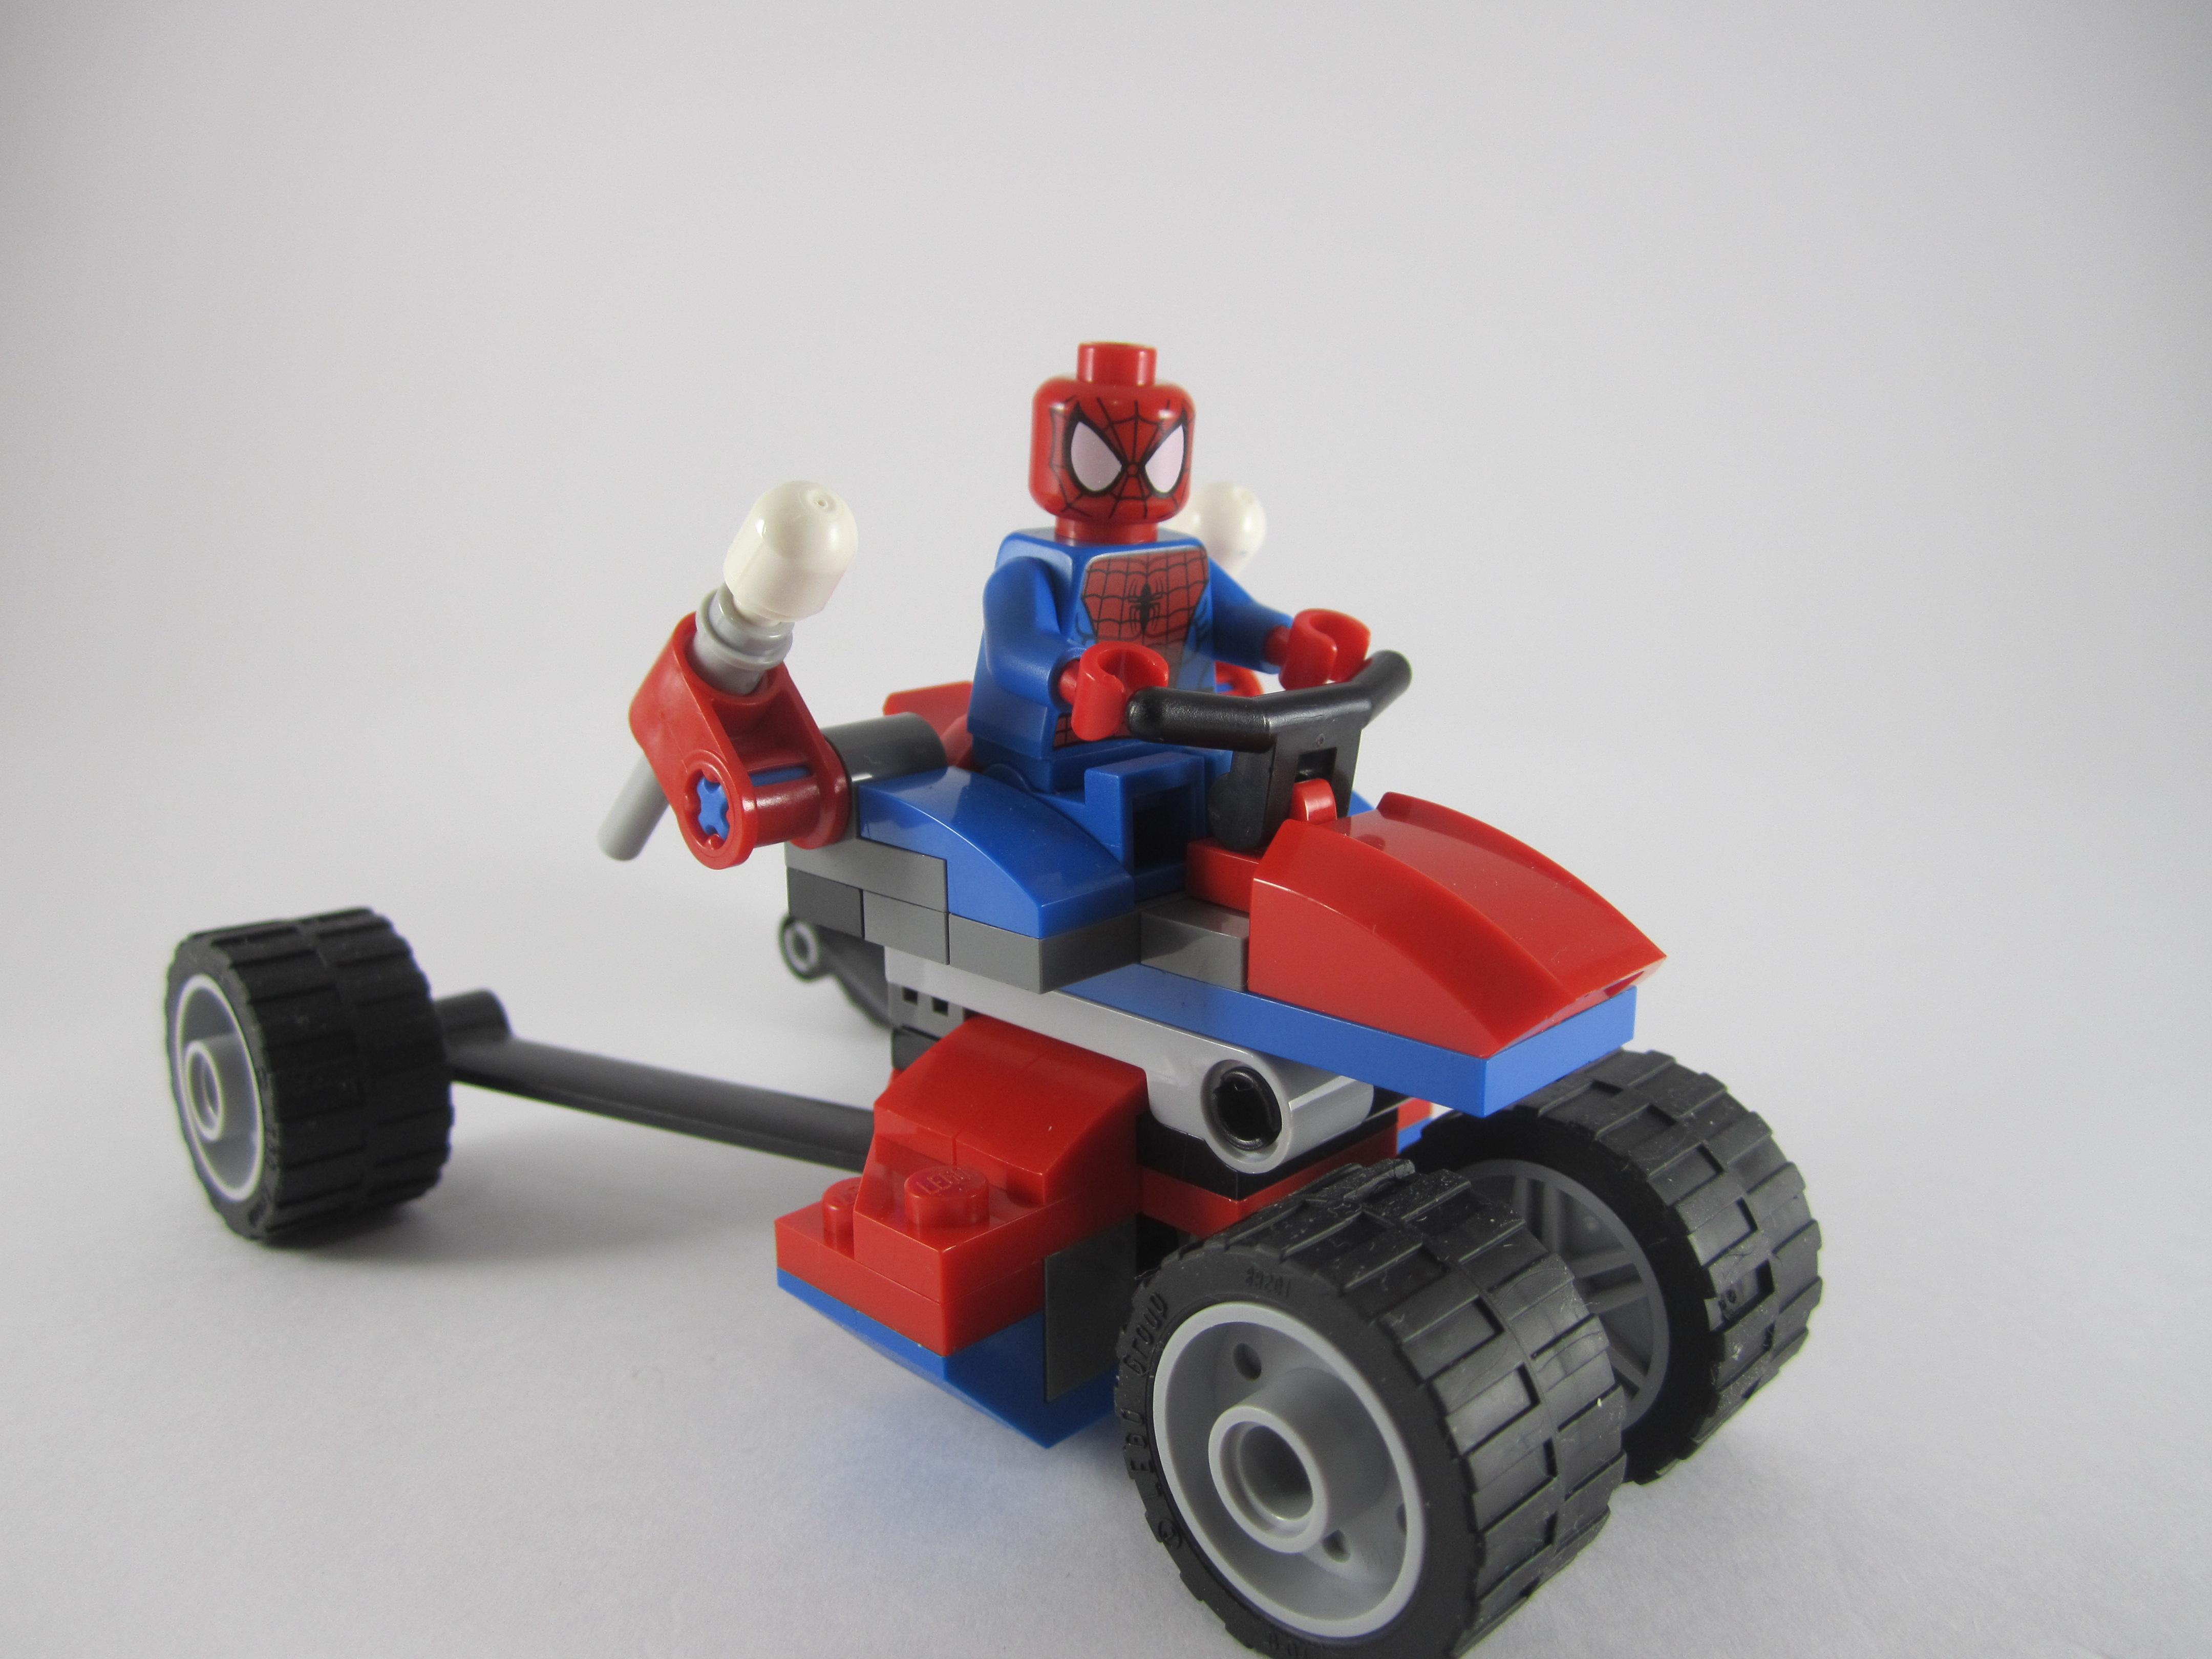 Lego ultimate spider man electro - photo#13